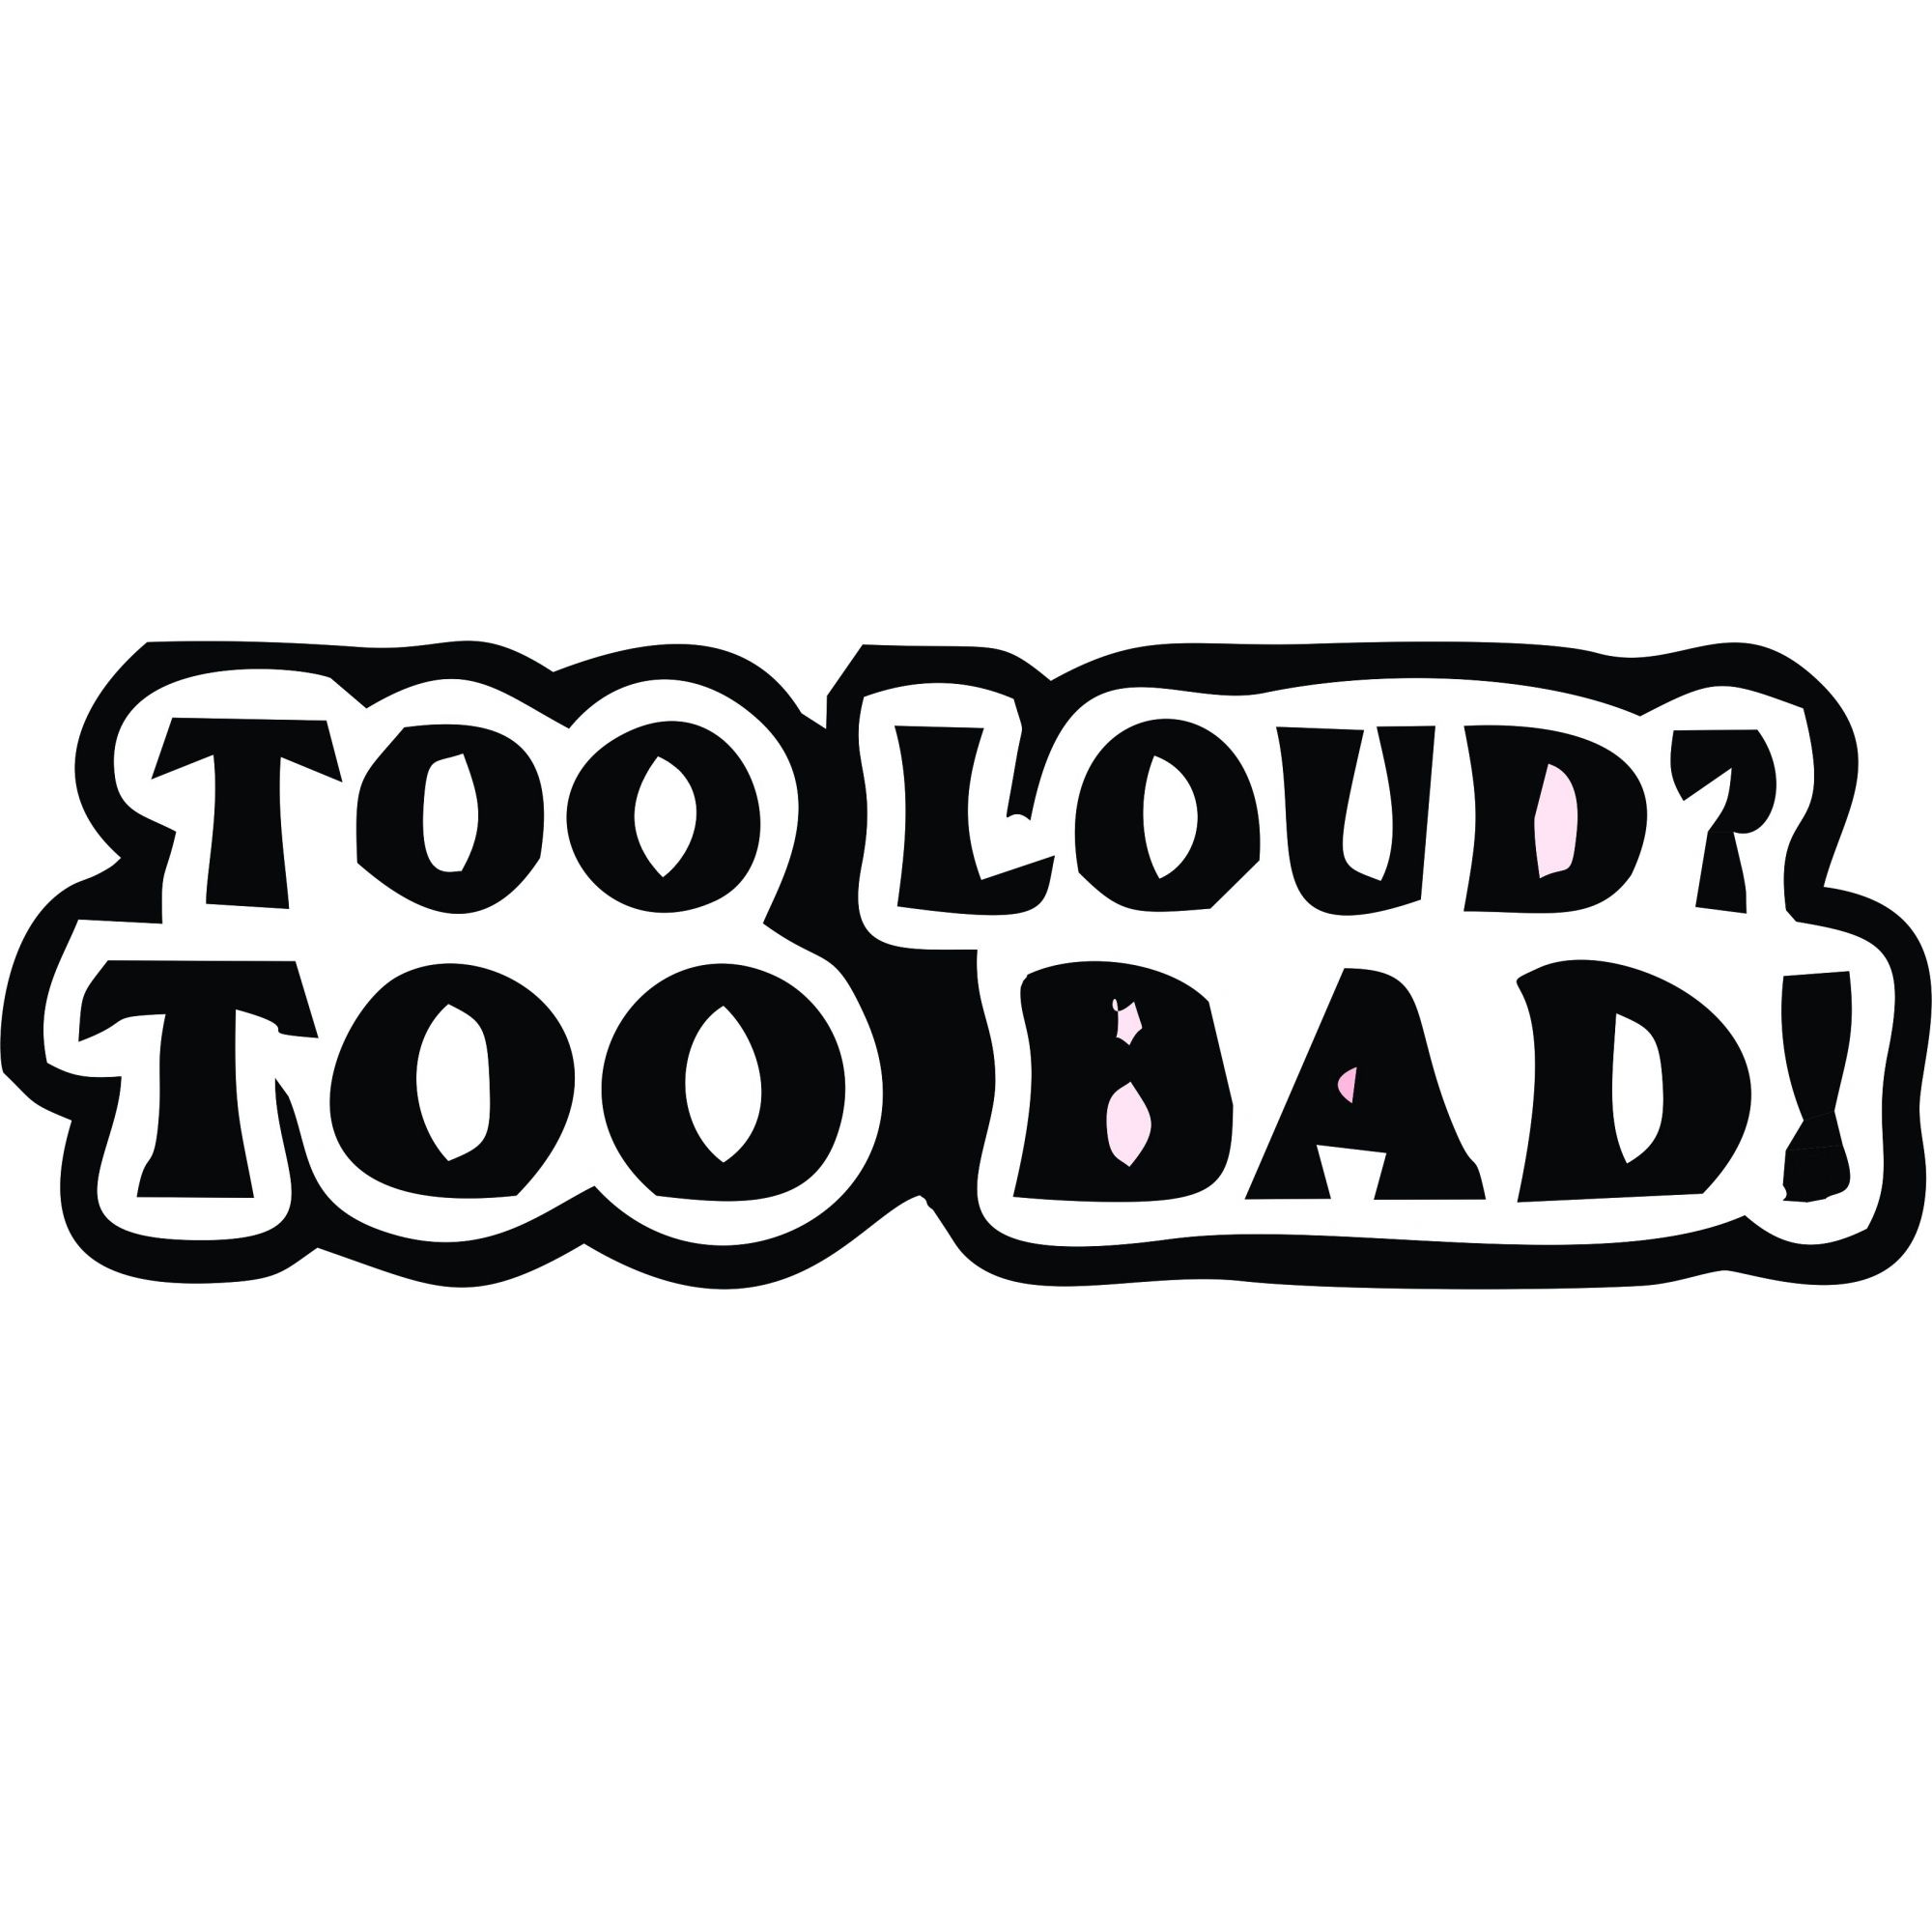 A1499 Auto Adesivo Automotivo Too Loud Too Bad